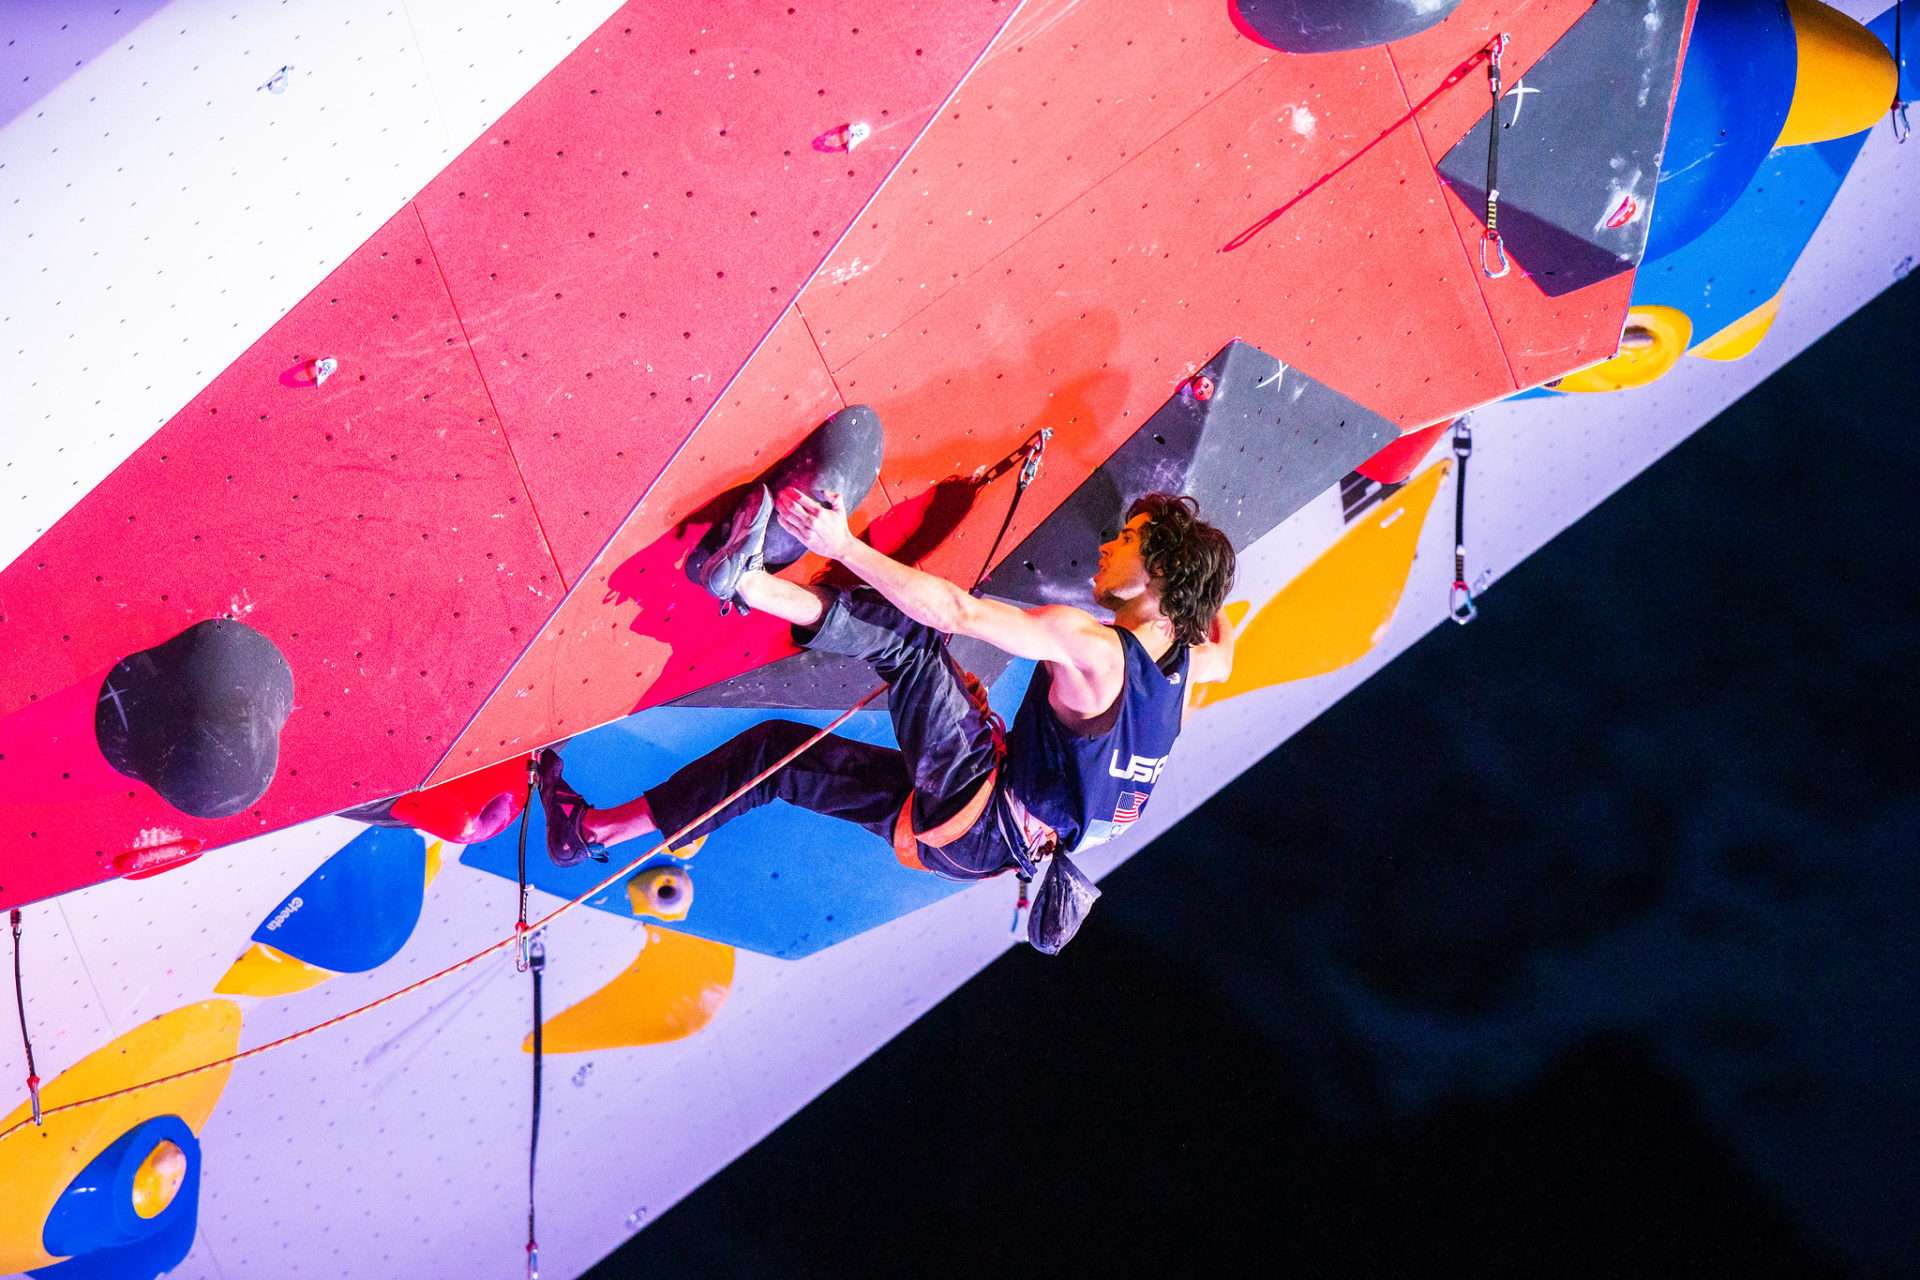 USA climber on climbing wall